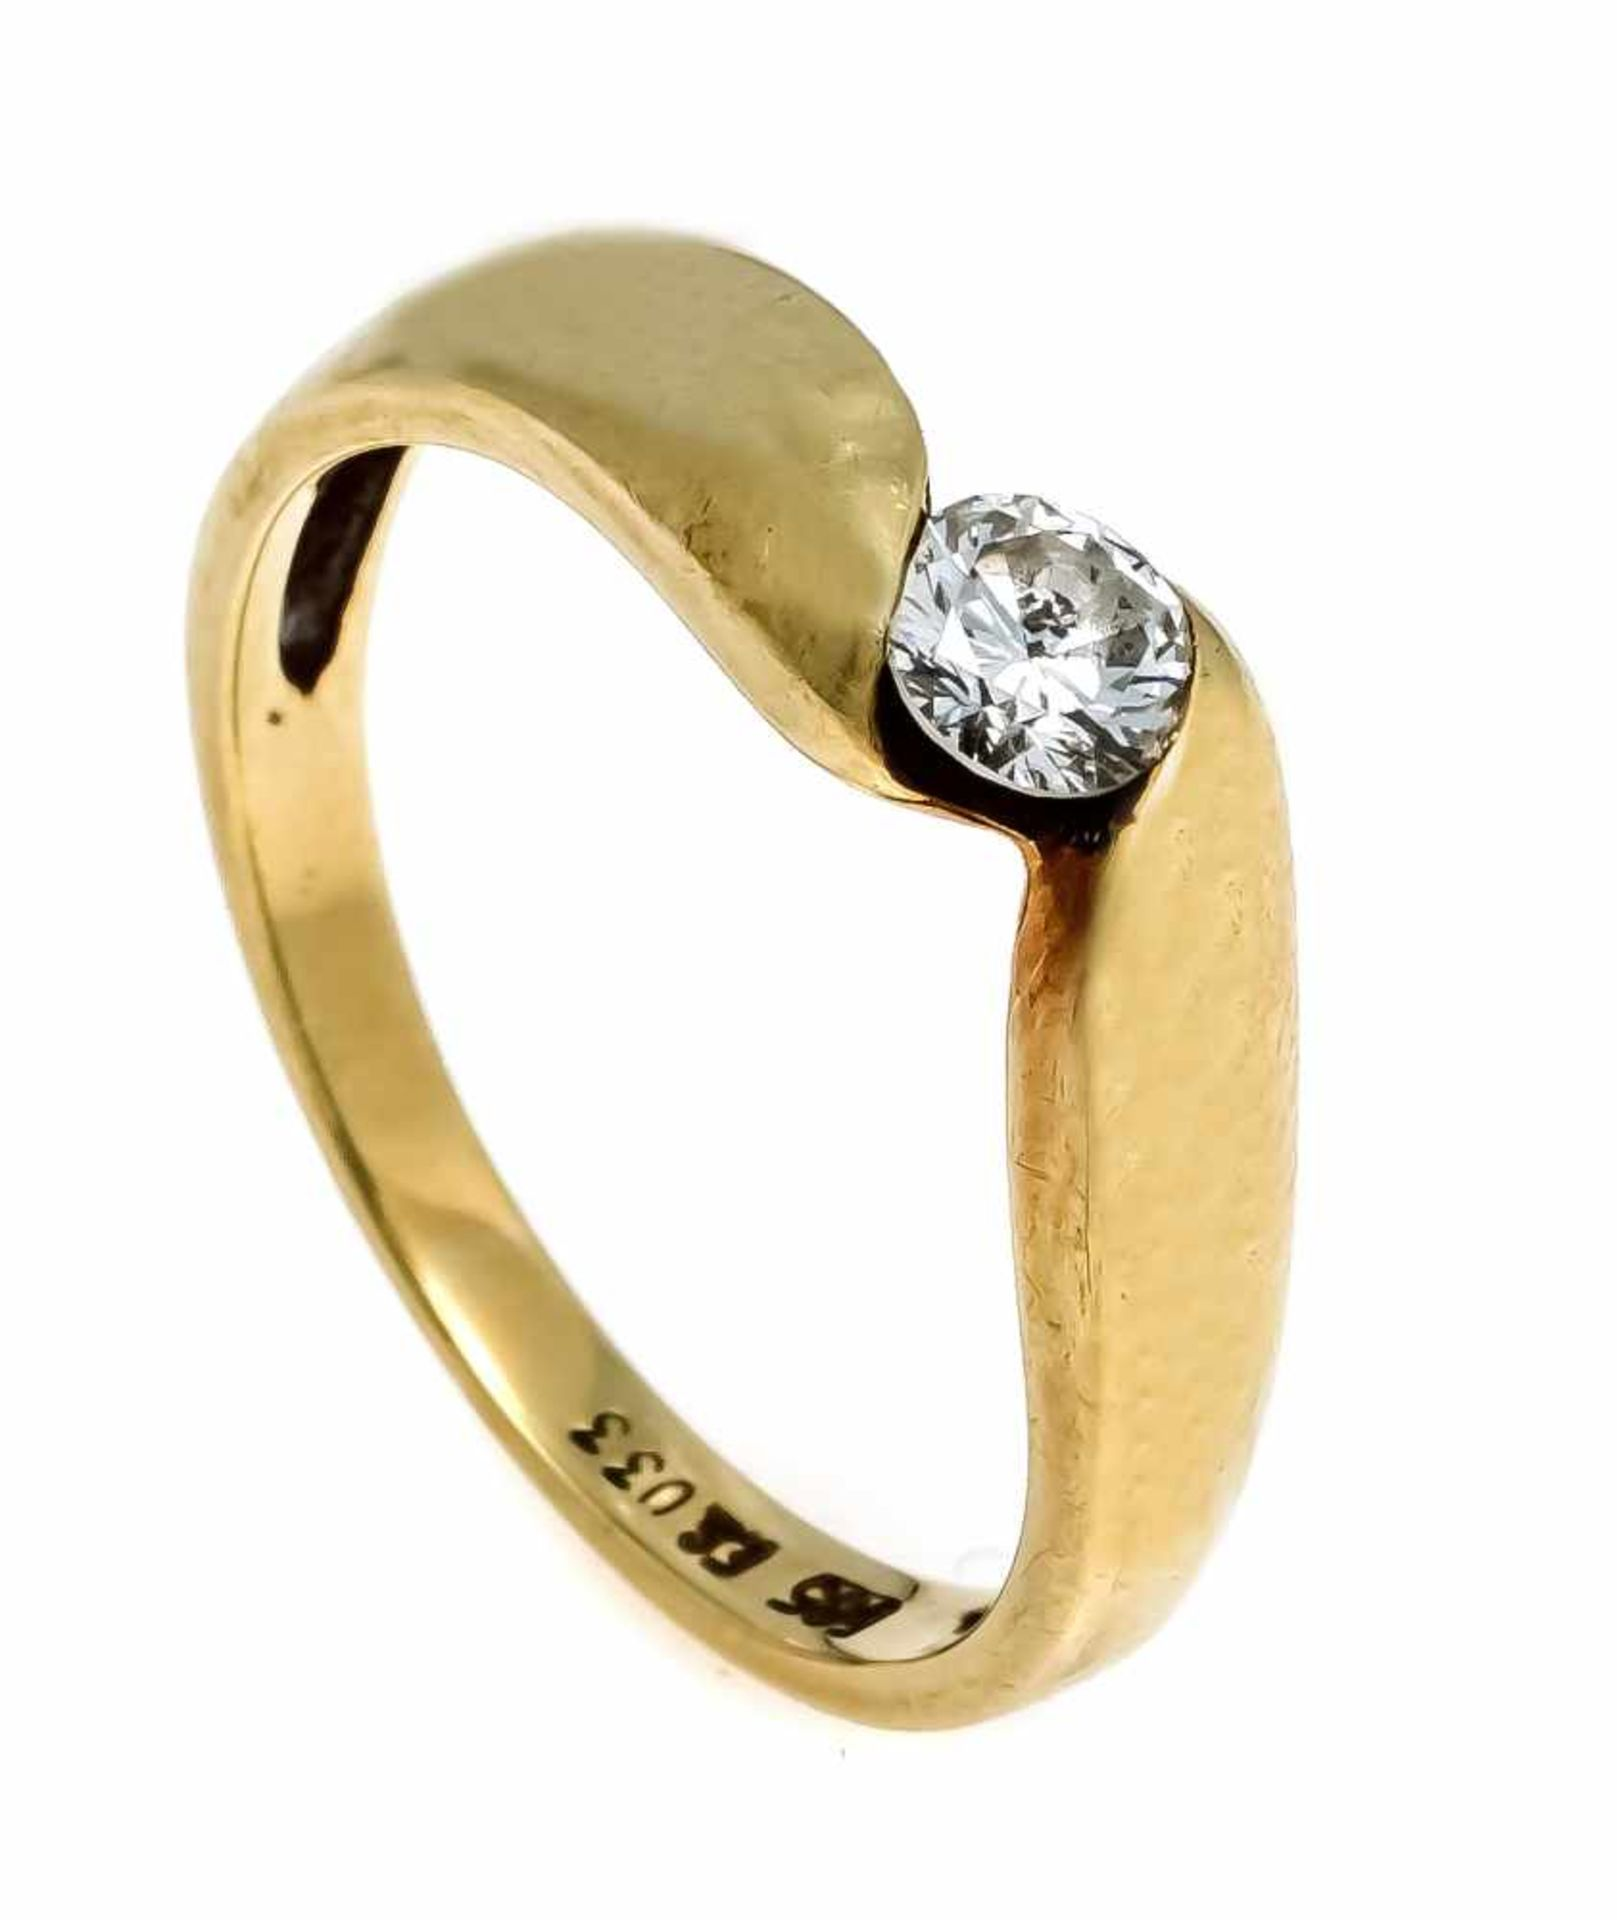 Brillant-Ring GG 585/000 mit einem Brillanten 0,33 ct l.get.W/VS-SI, RG 55, 3,6 gDiamond ring GG